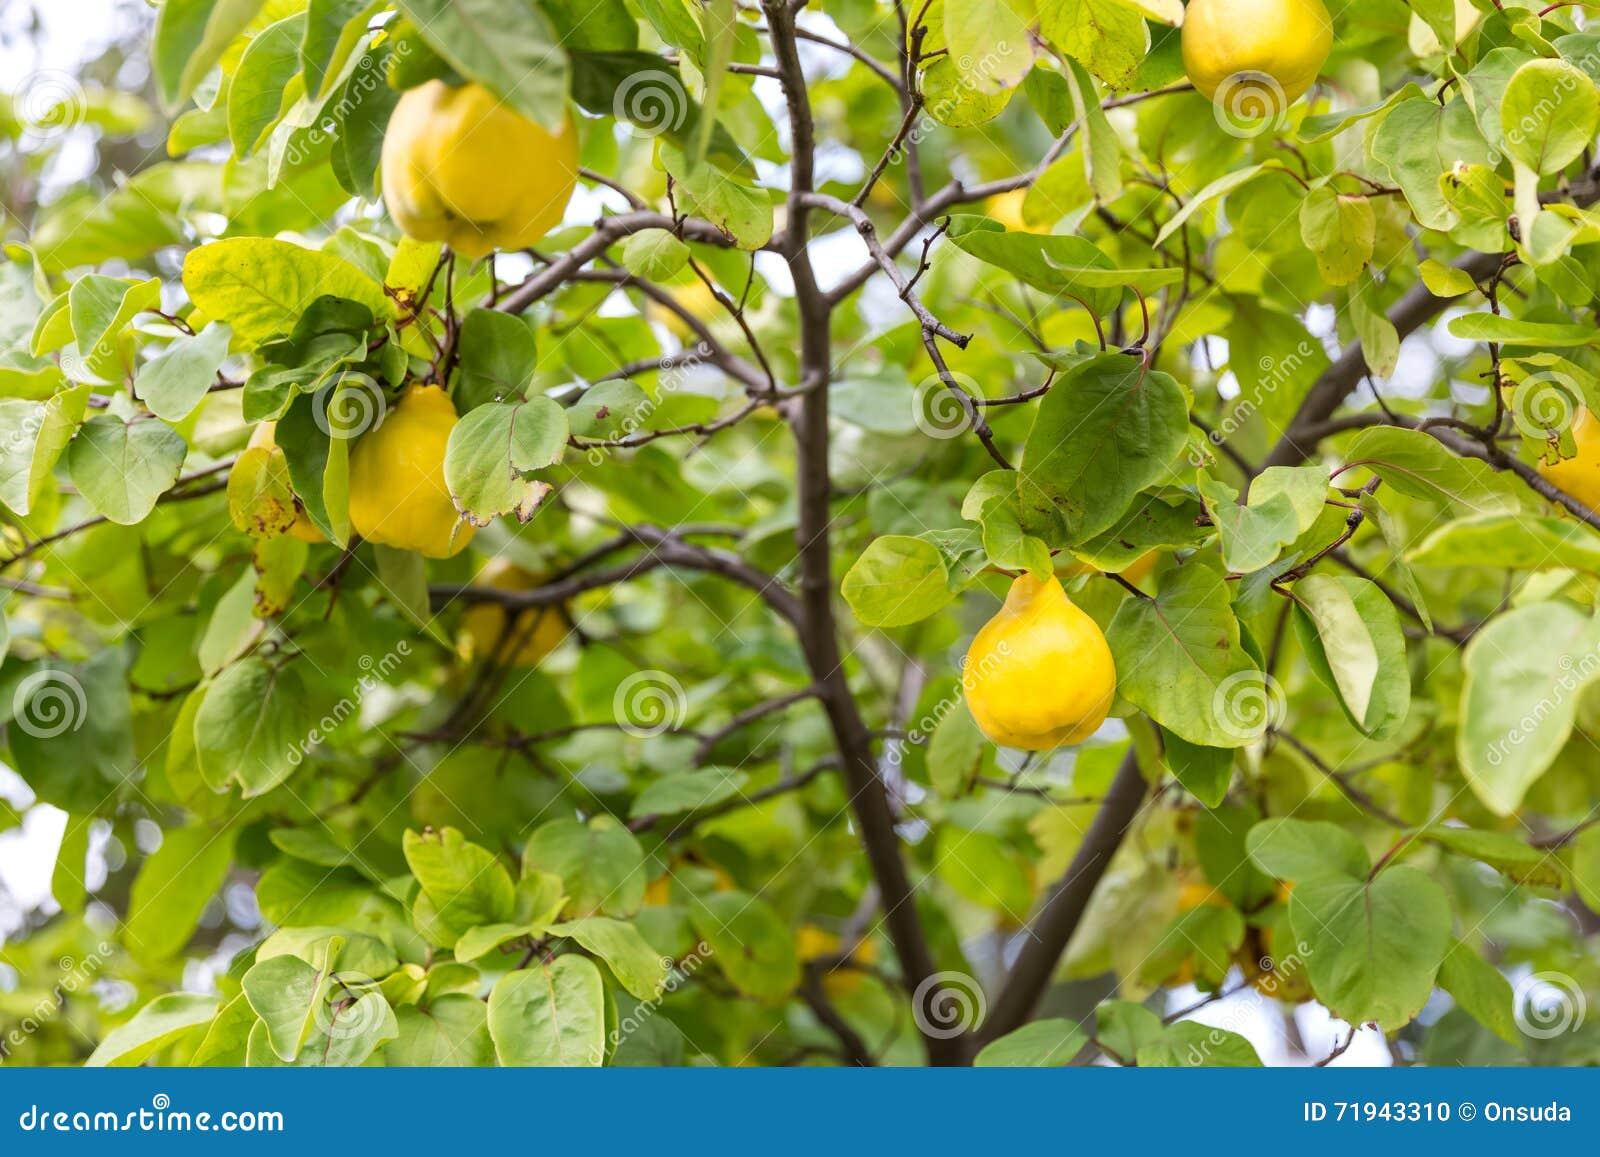 Желтые груши на дереве